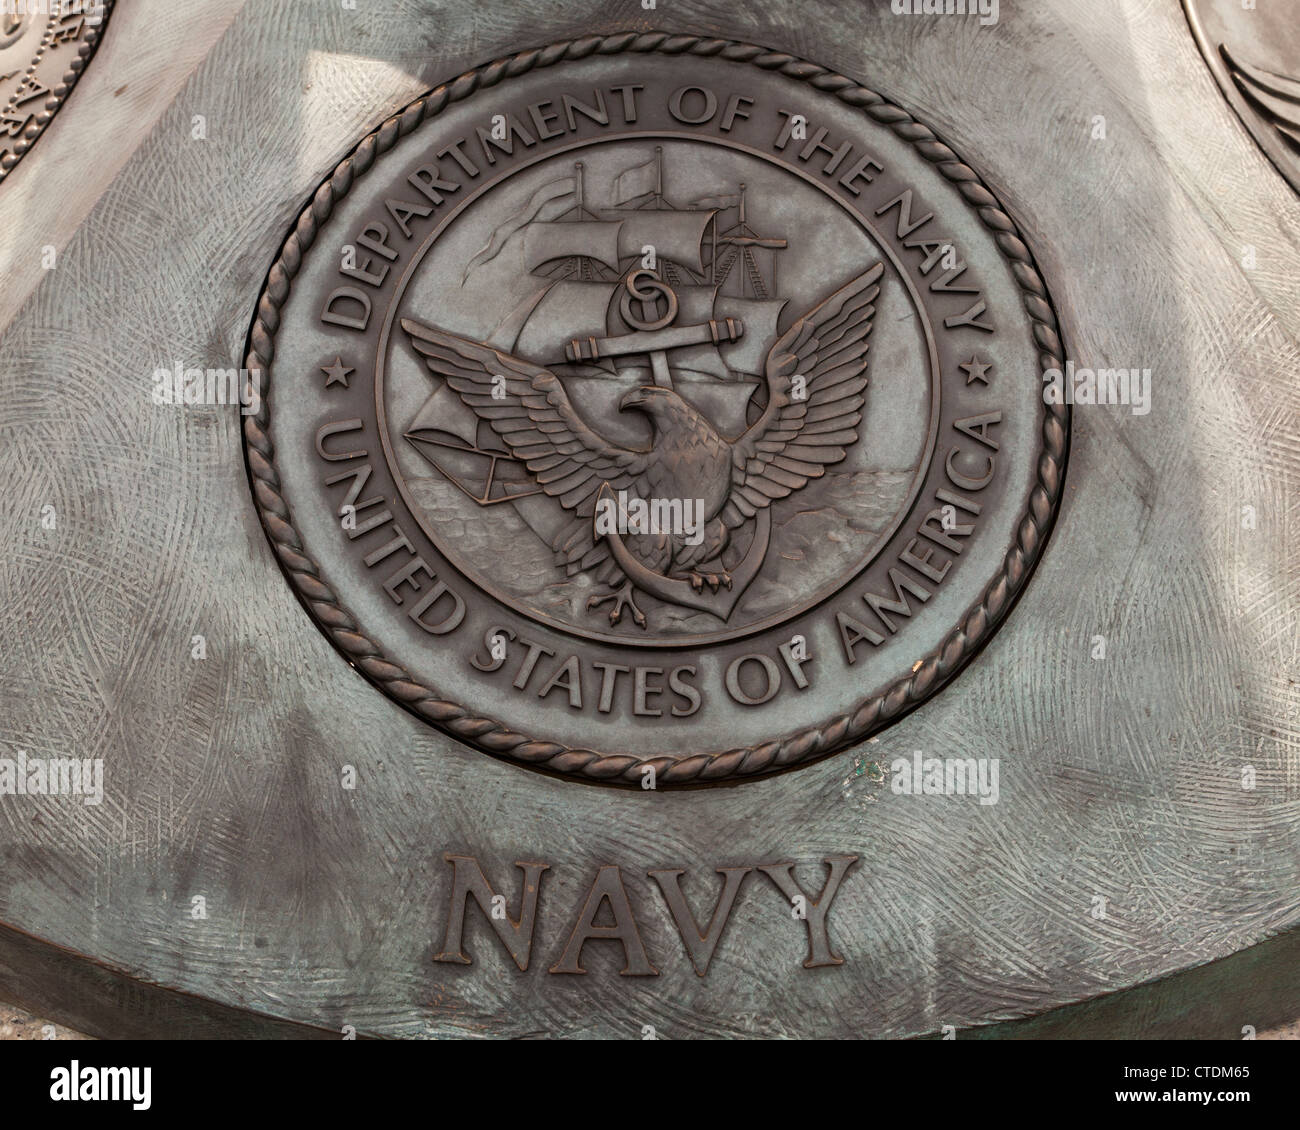 US Navy seal - Stock Image